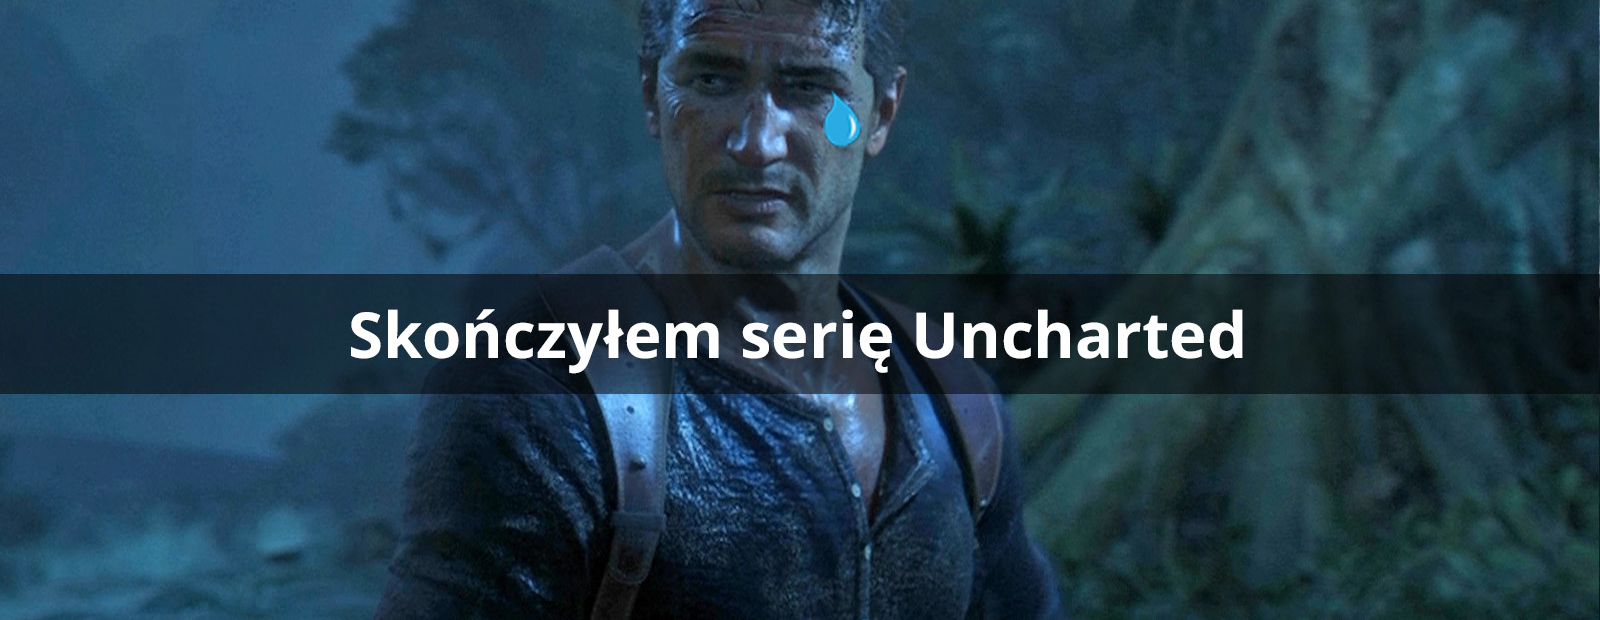 uncharted koniec2